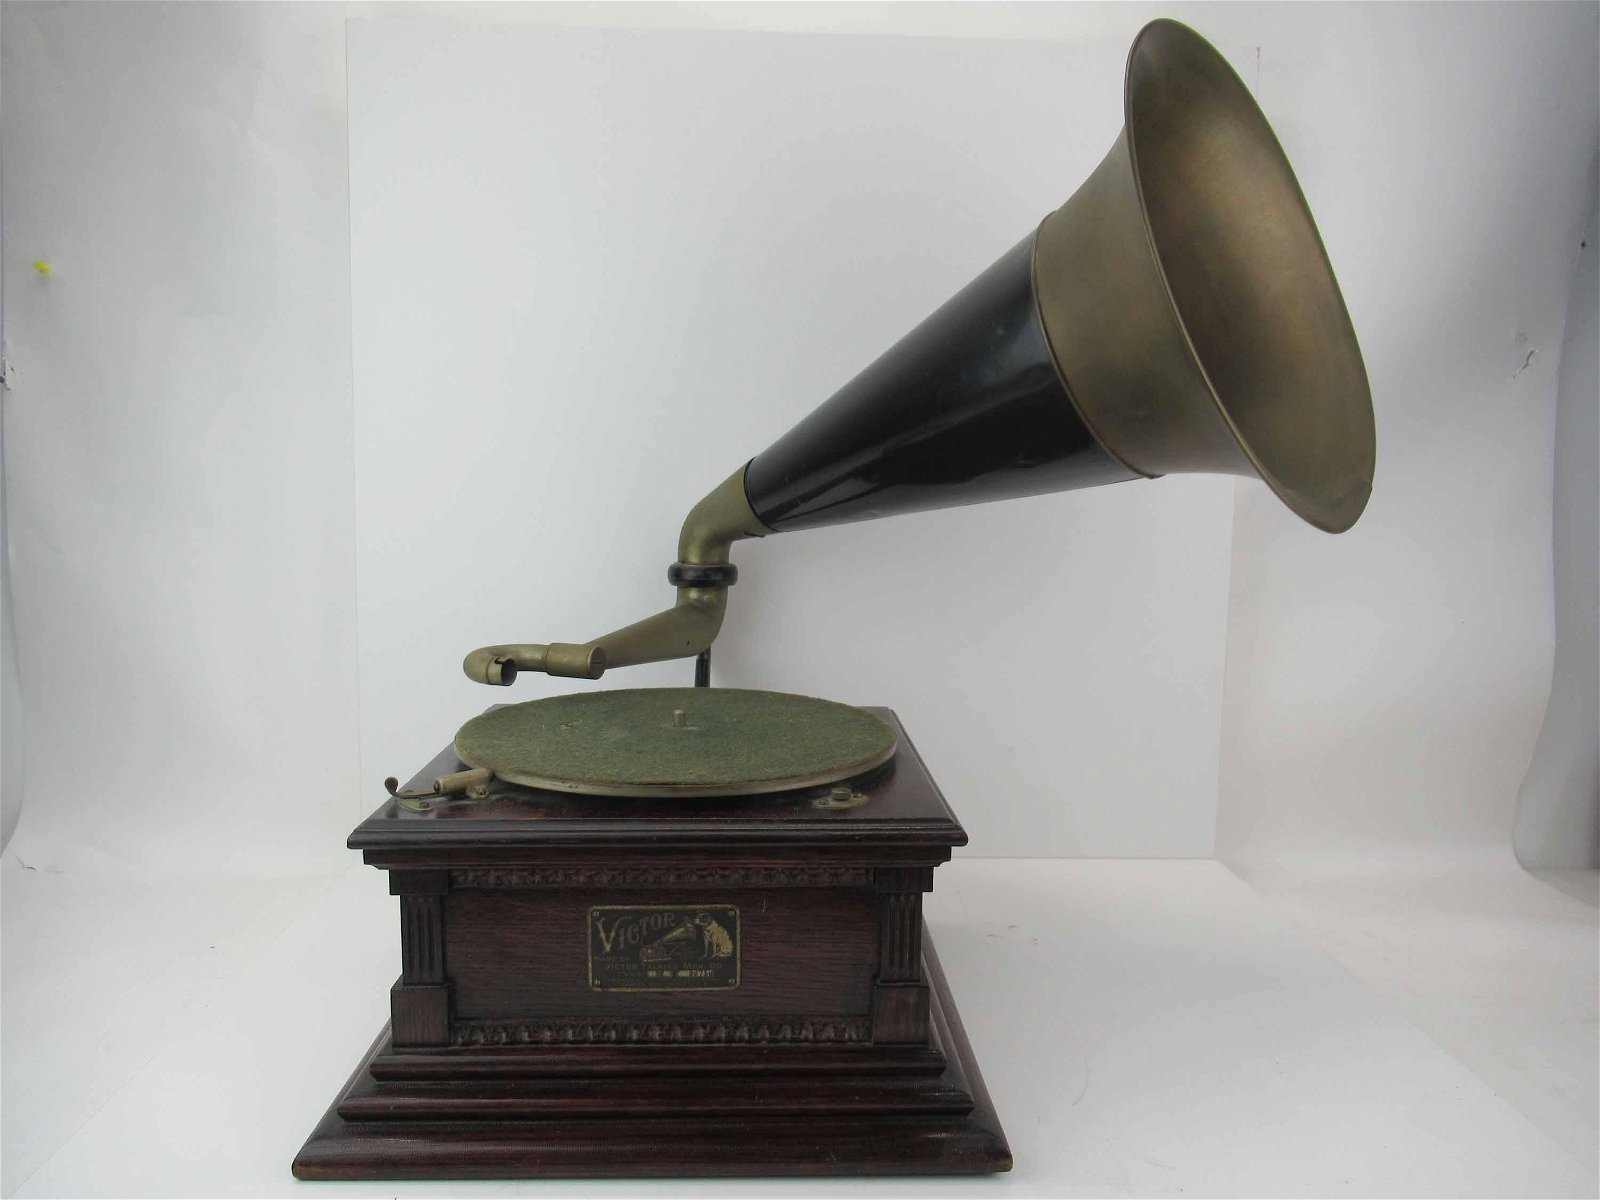 Vintage Victor Talking Machine Model M #38719